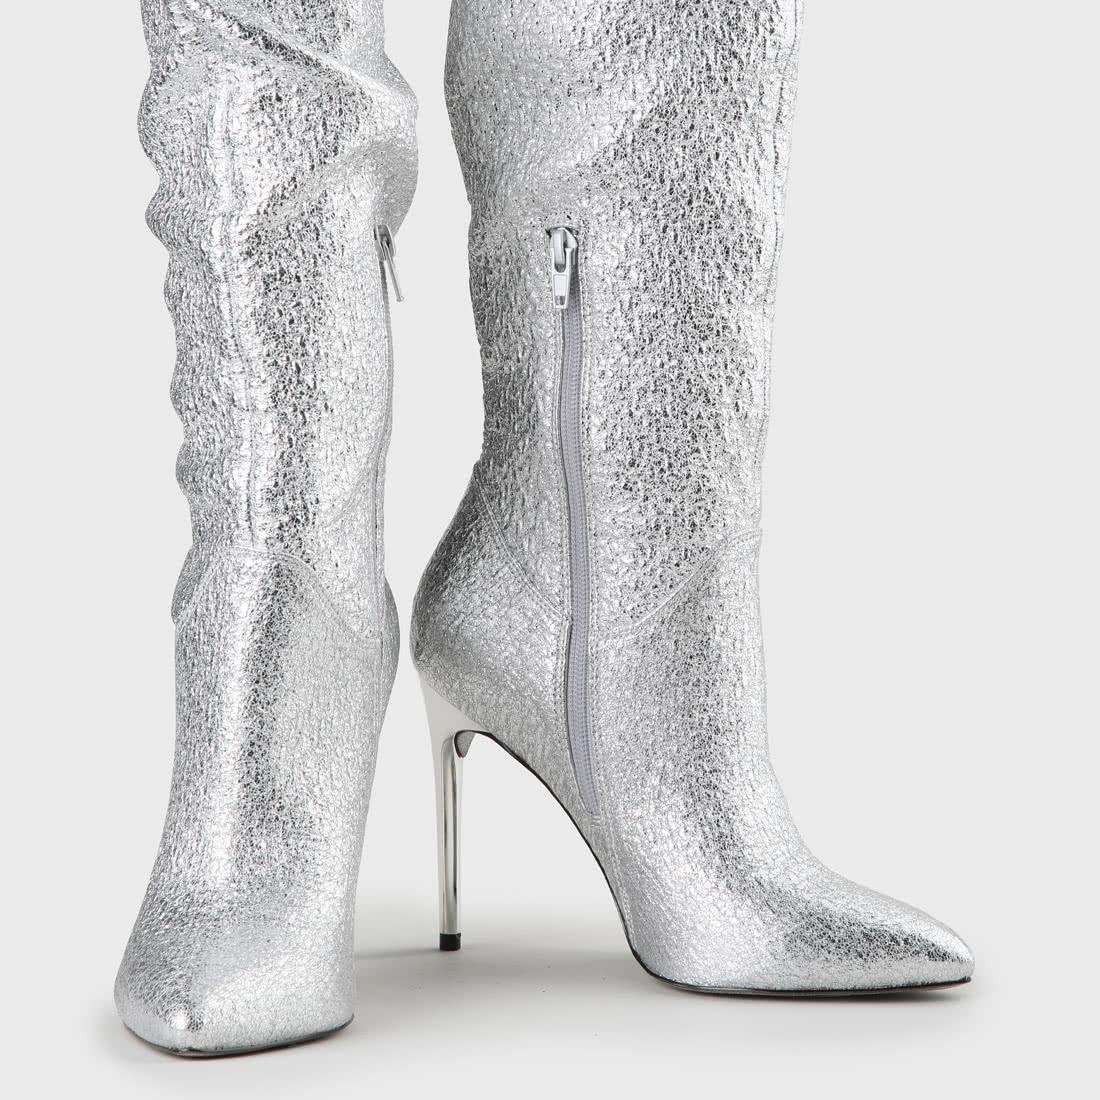 Silver Faux Overknee Leather Frana Boots c4j3AR5qL